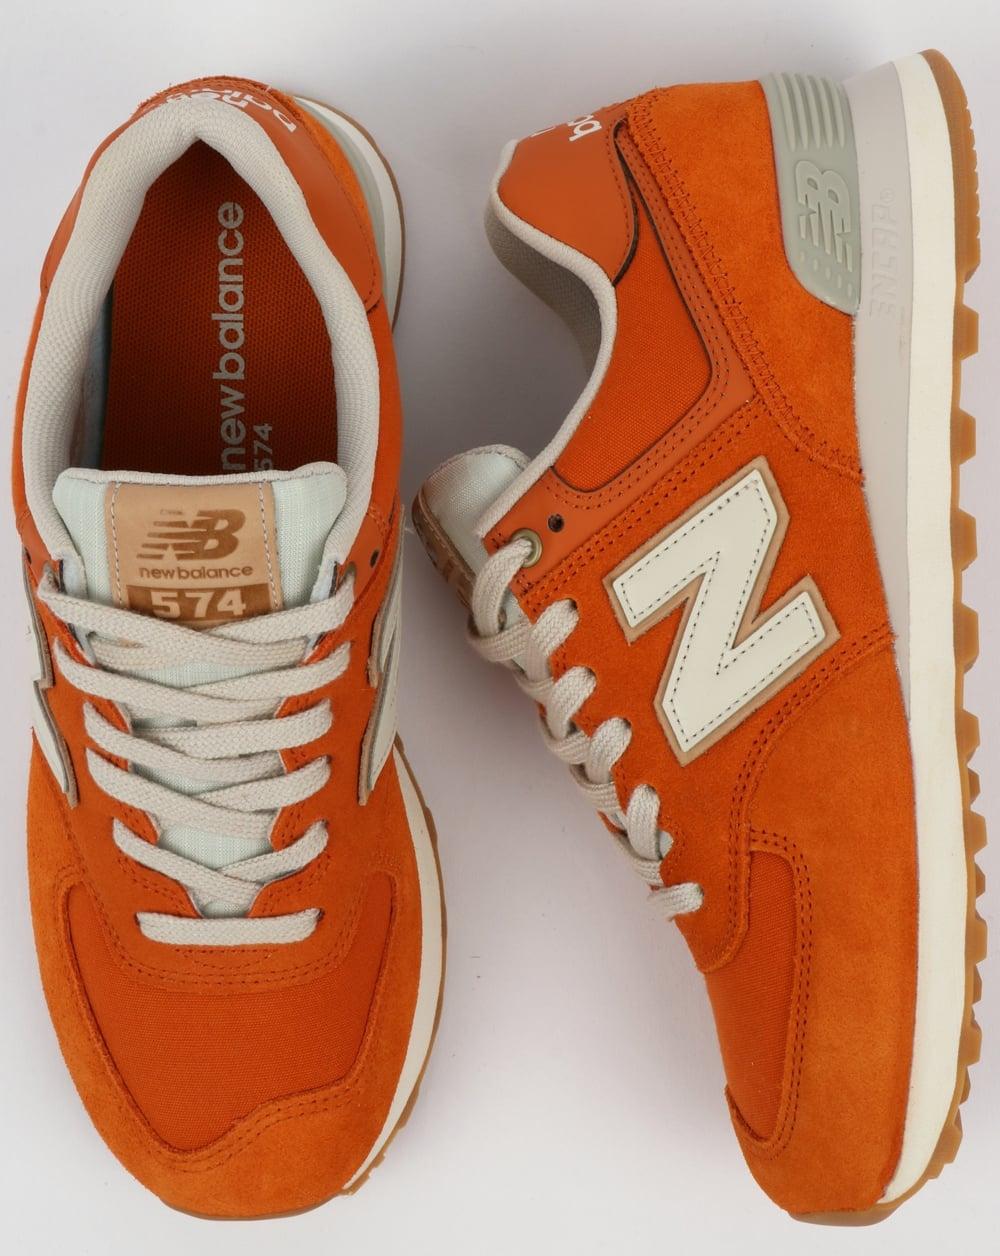 4c2fa3d3f0c New Balance 574 Trainers Orange/Moonbeam